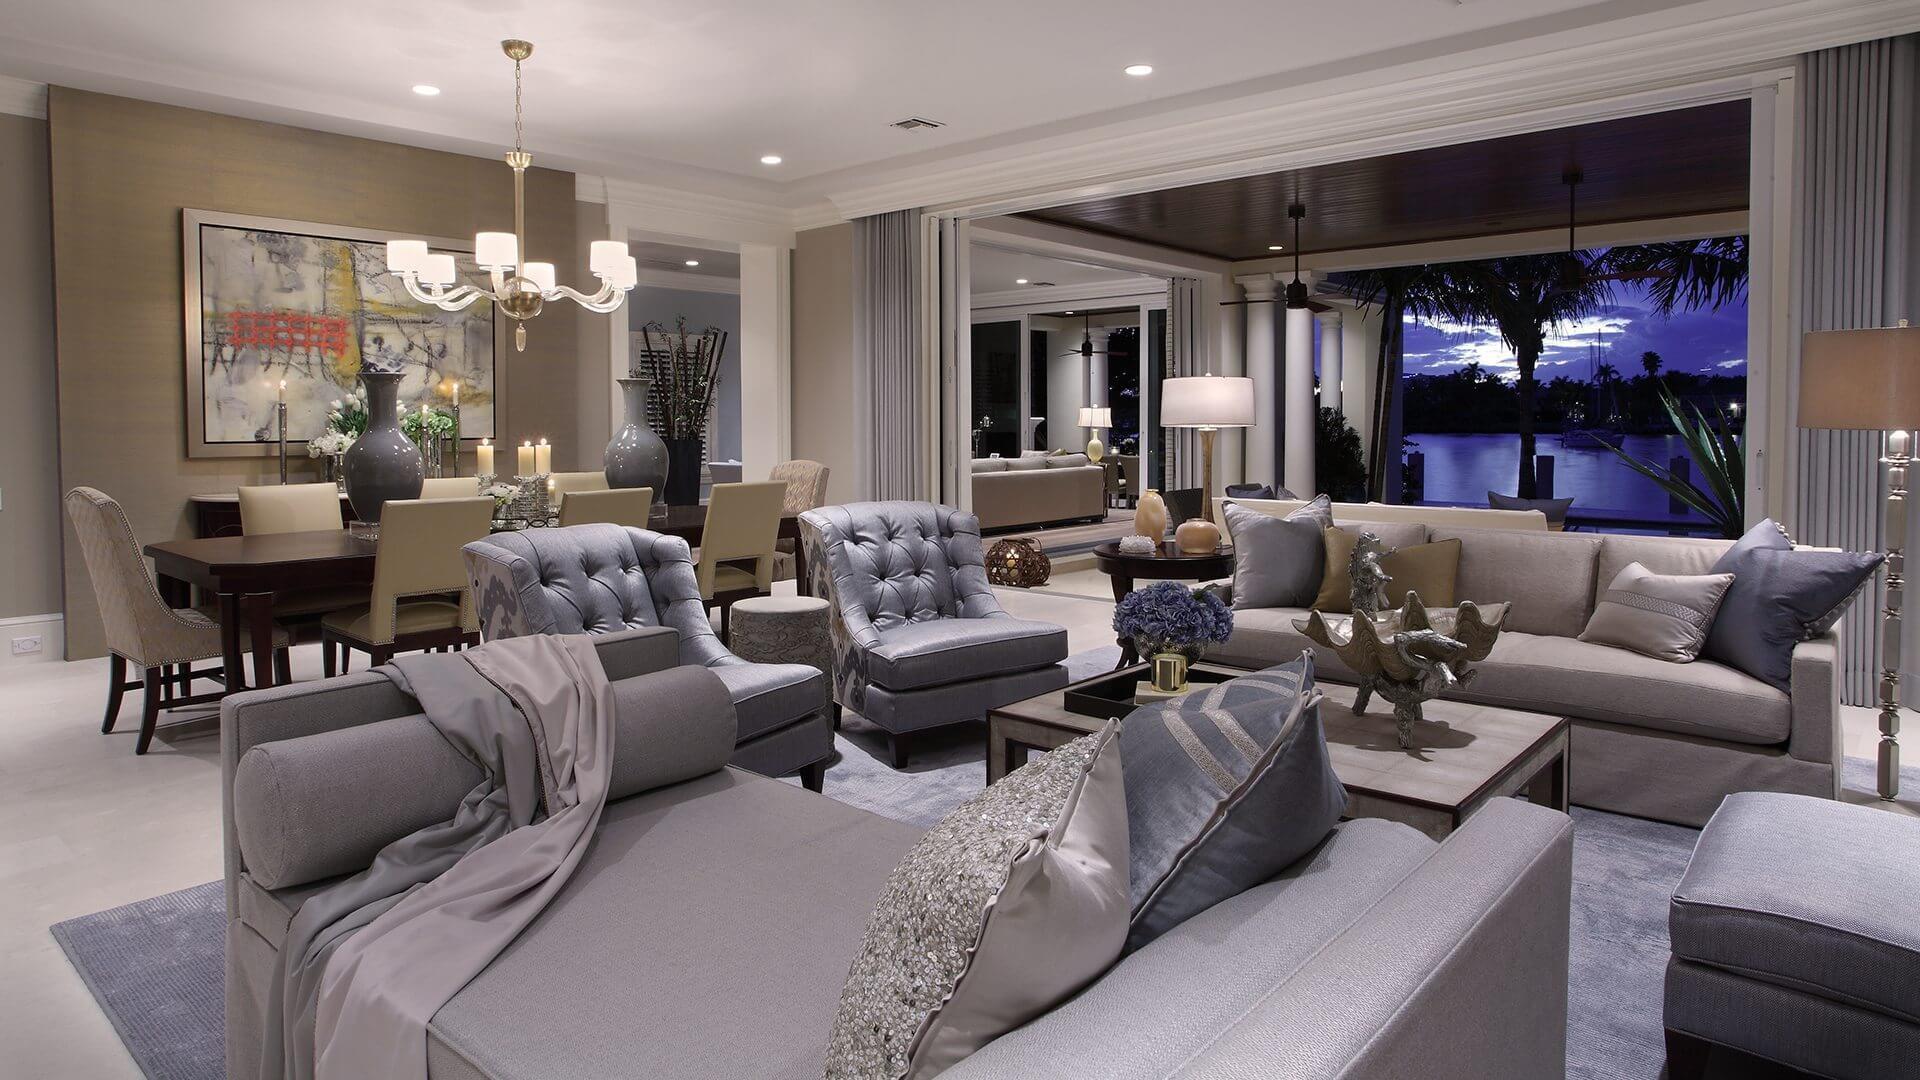 Marc-Michaels Fort Lauderdale Coastal Transitional Design Feature Living Space